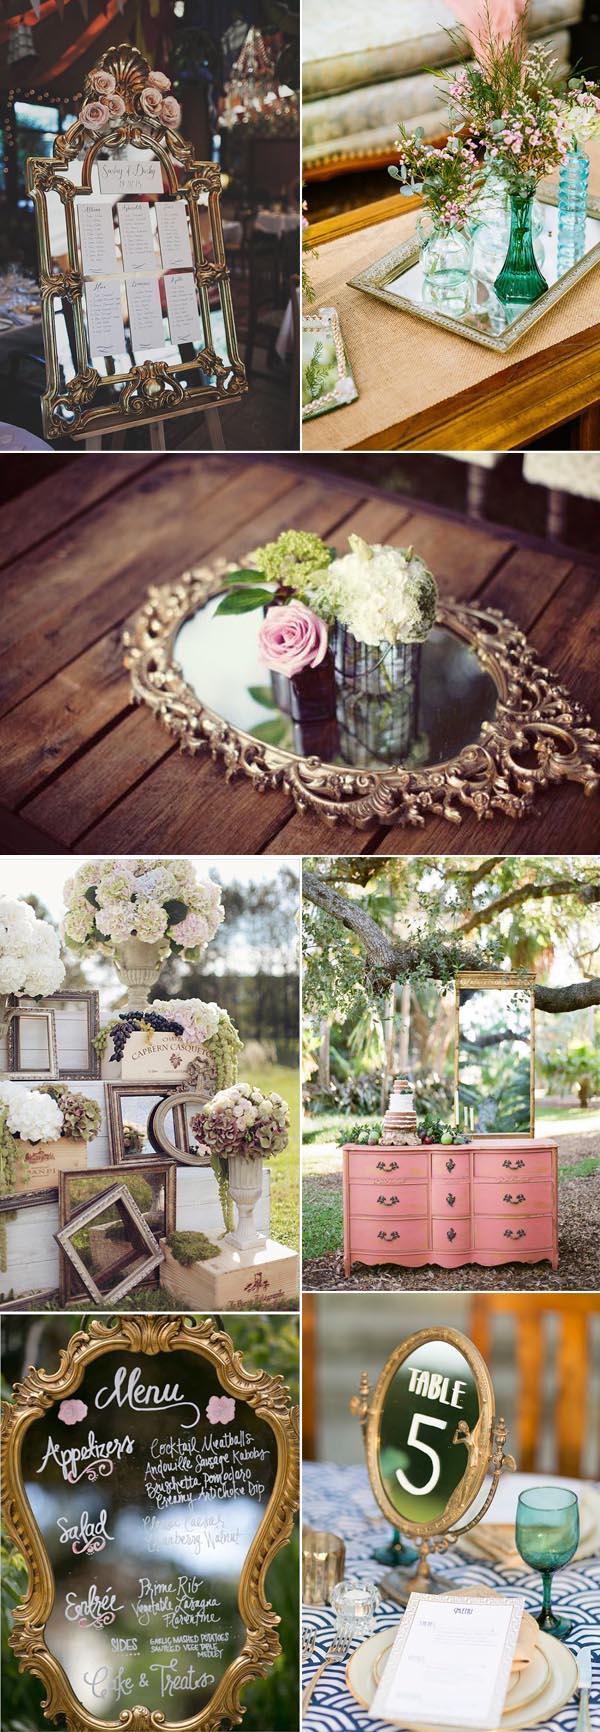 Diy Vintage Wedding 50 Creative Ideas To Add Vintage Charm To Your Wedding Decorations